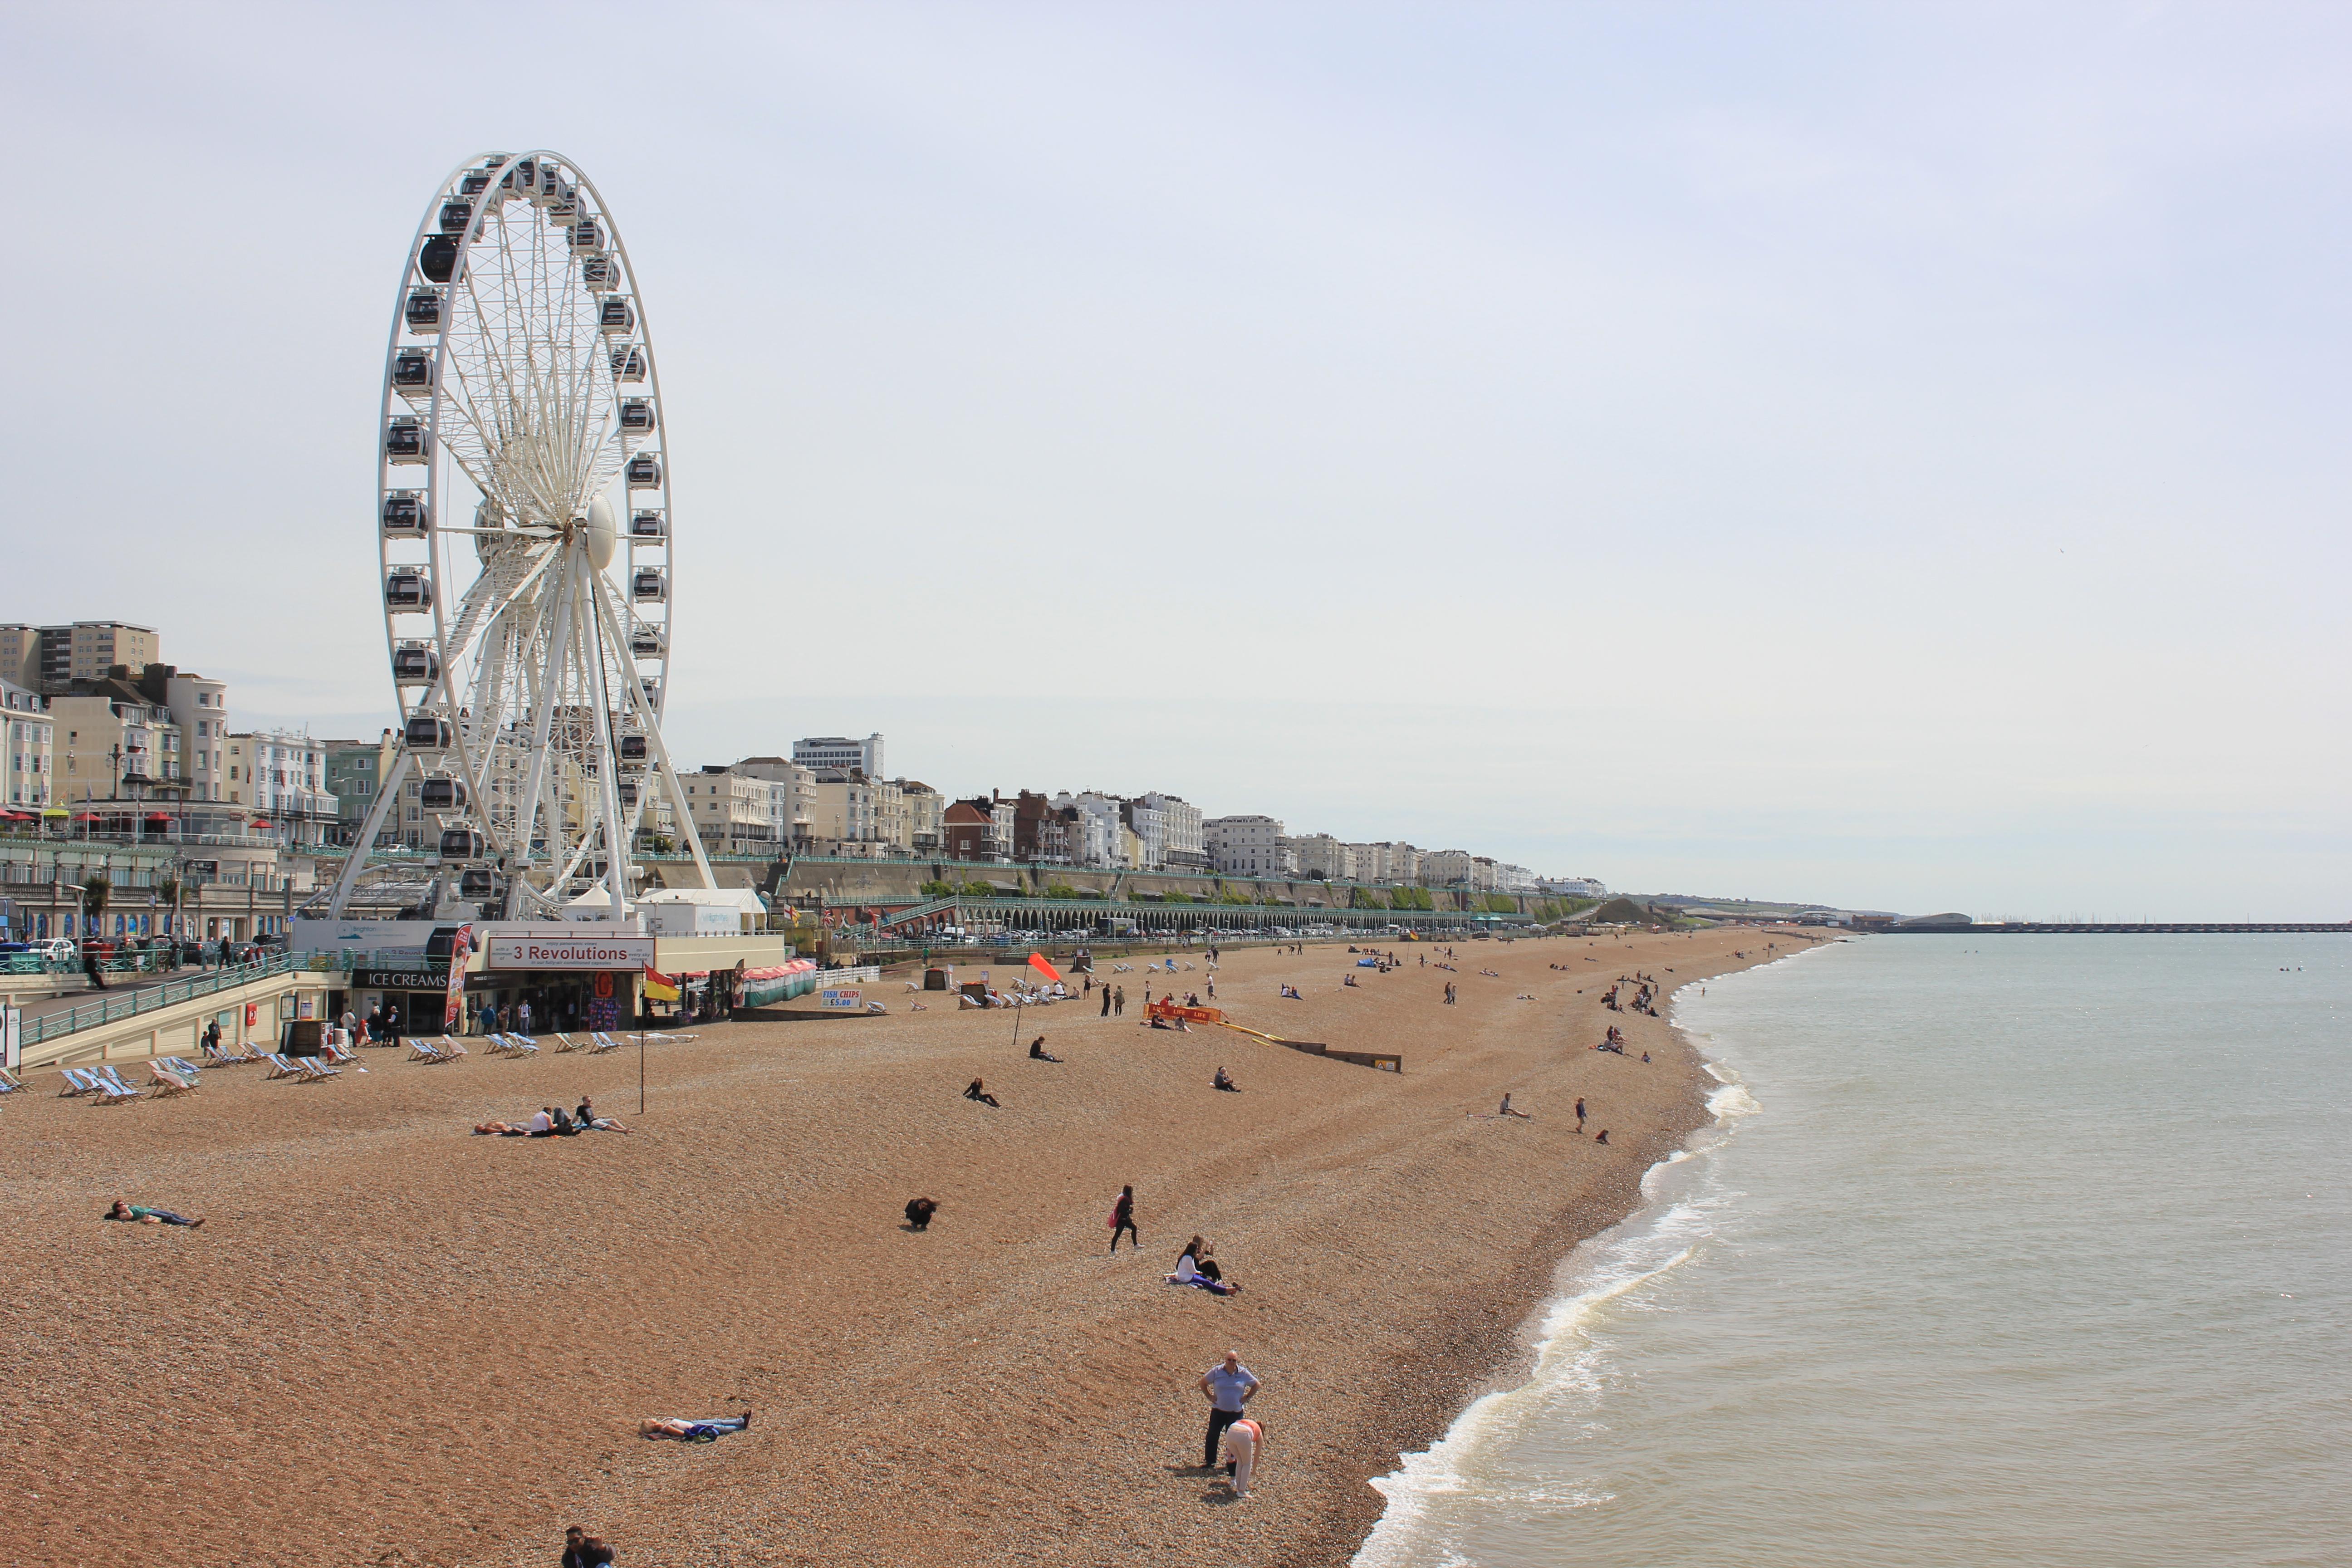 Brighton beach england beach treasures and treasure beaches for The brighton